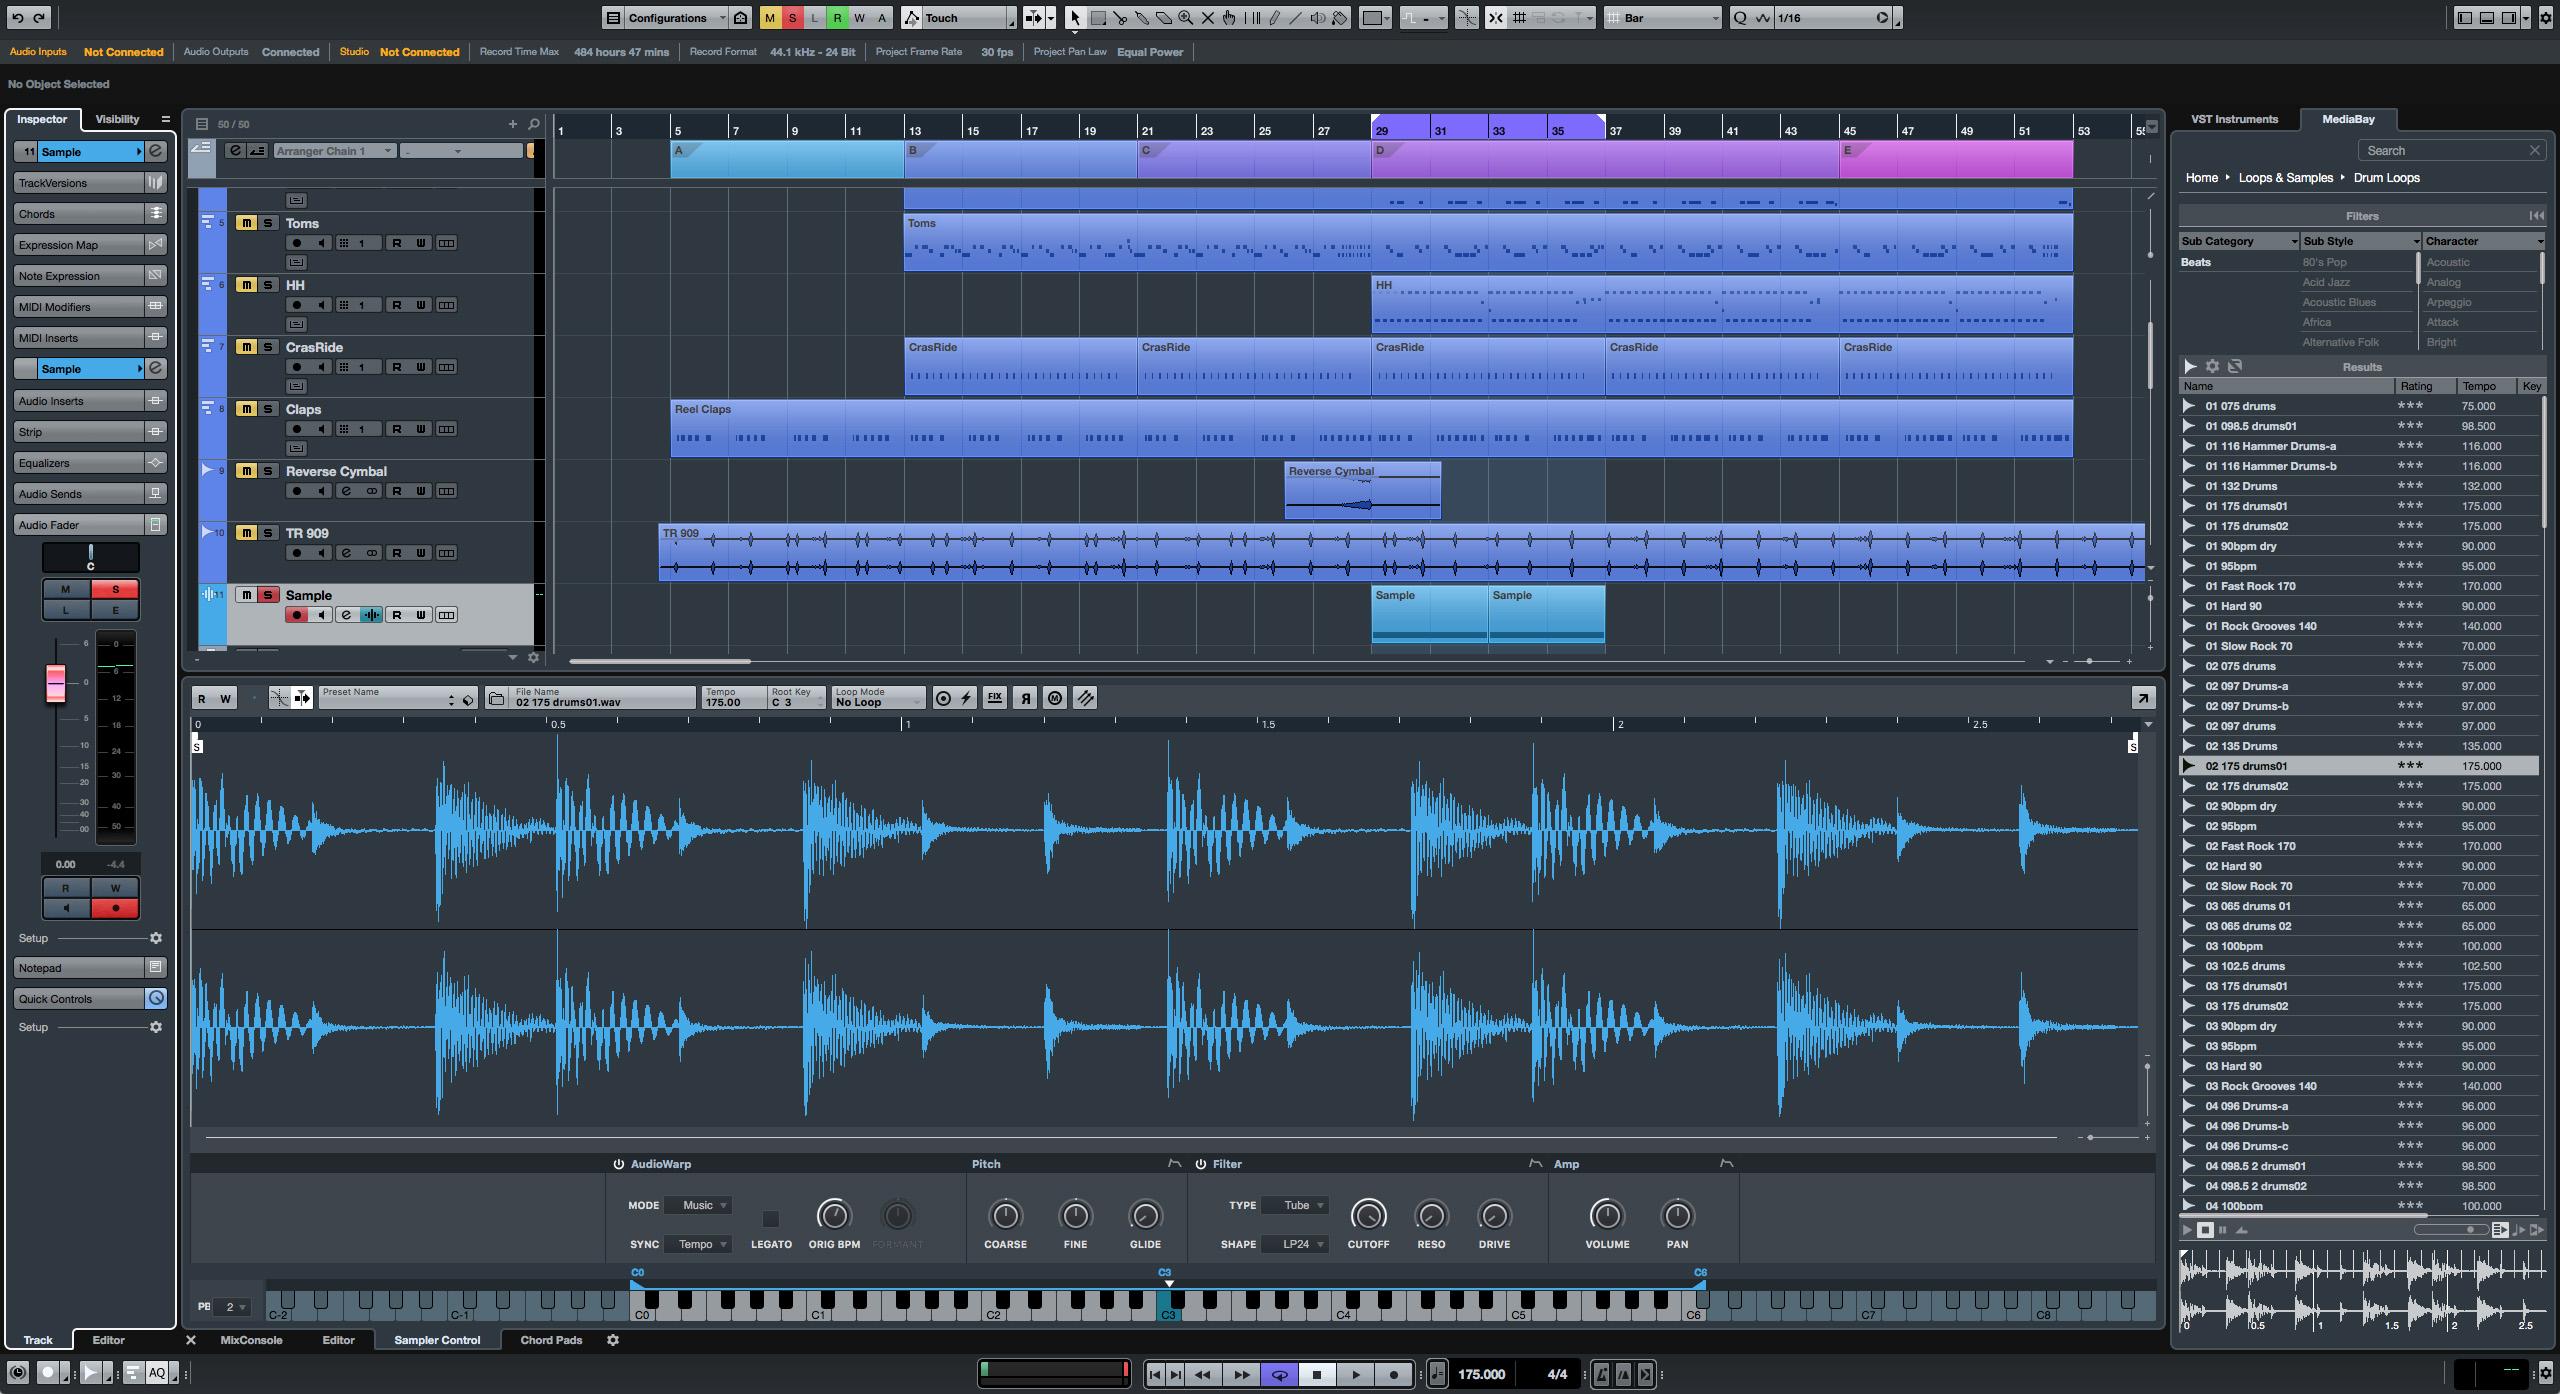 Cubase Pro 9 Studio DAW Software (Full Licence)